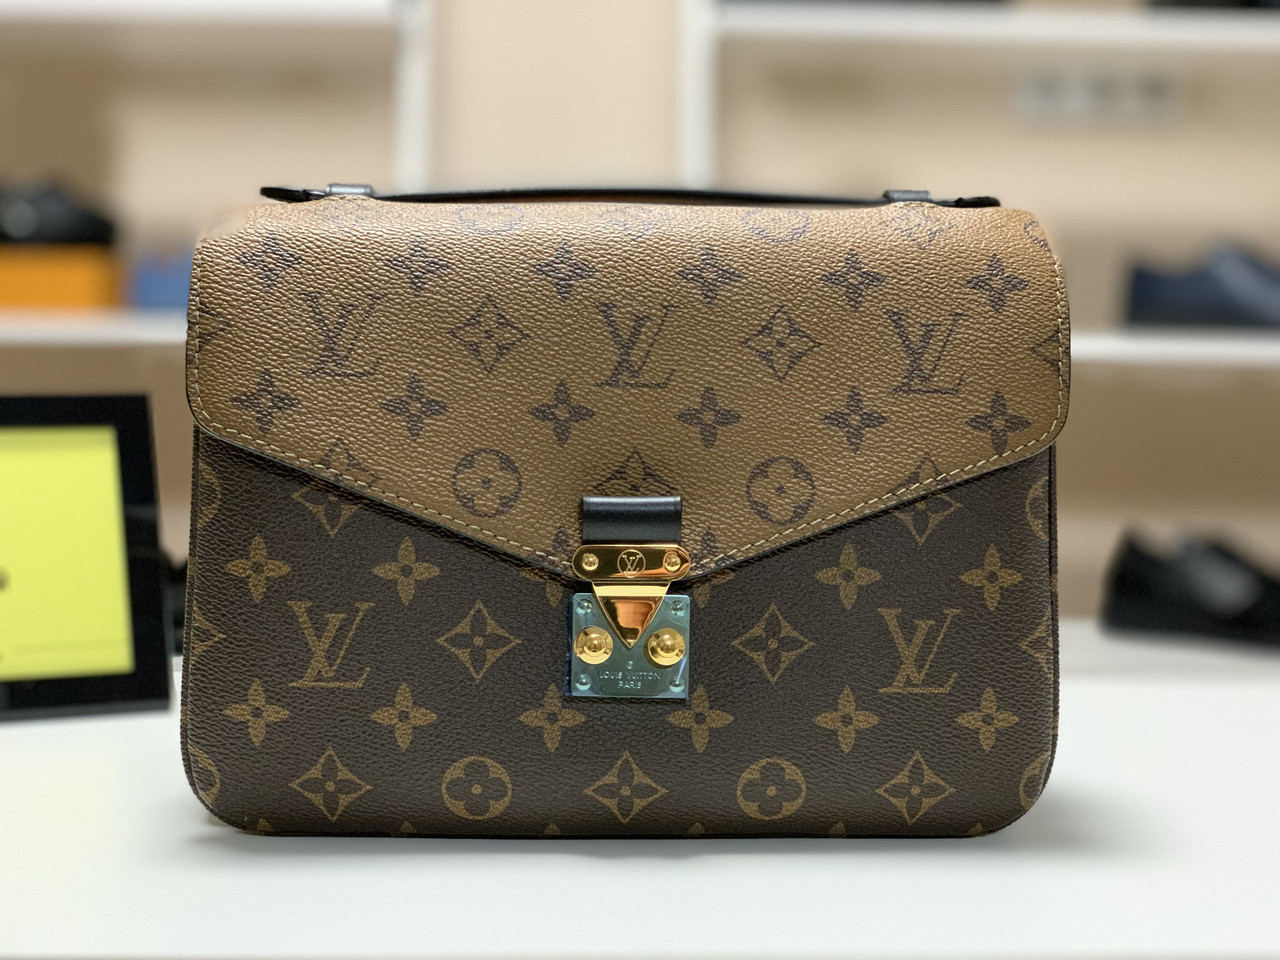 64d65f9e4501 Женская сумка Louis Vuitton Pochette Metis, цена 7 990 грн., купить ...